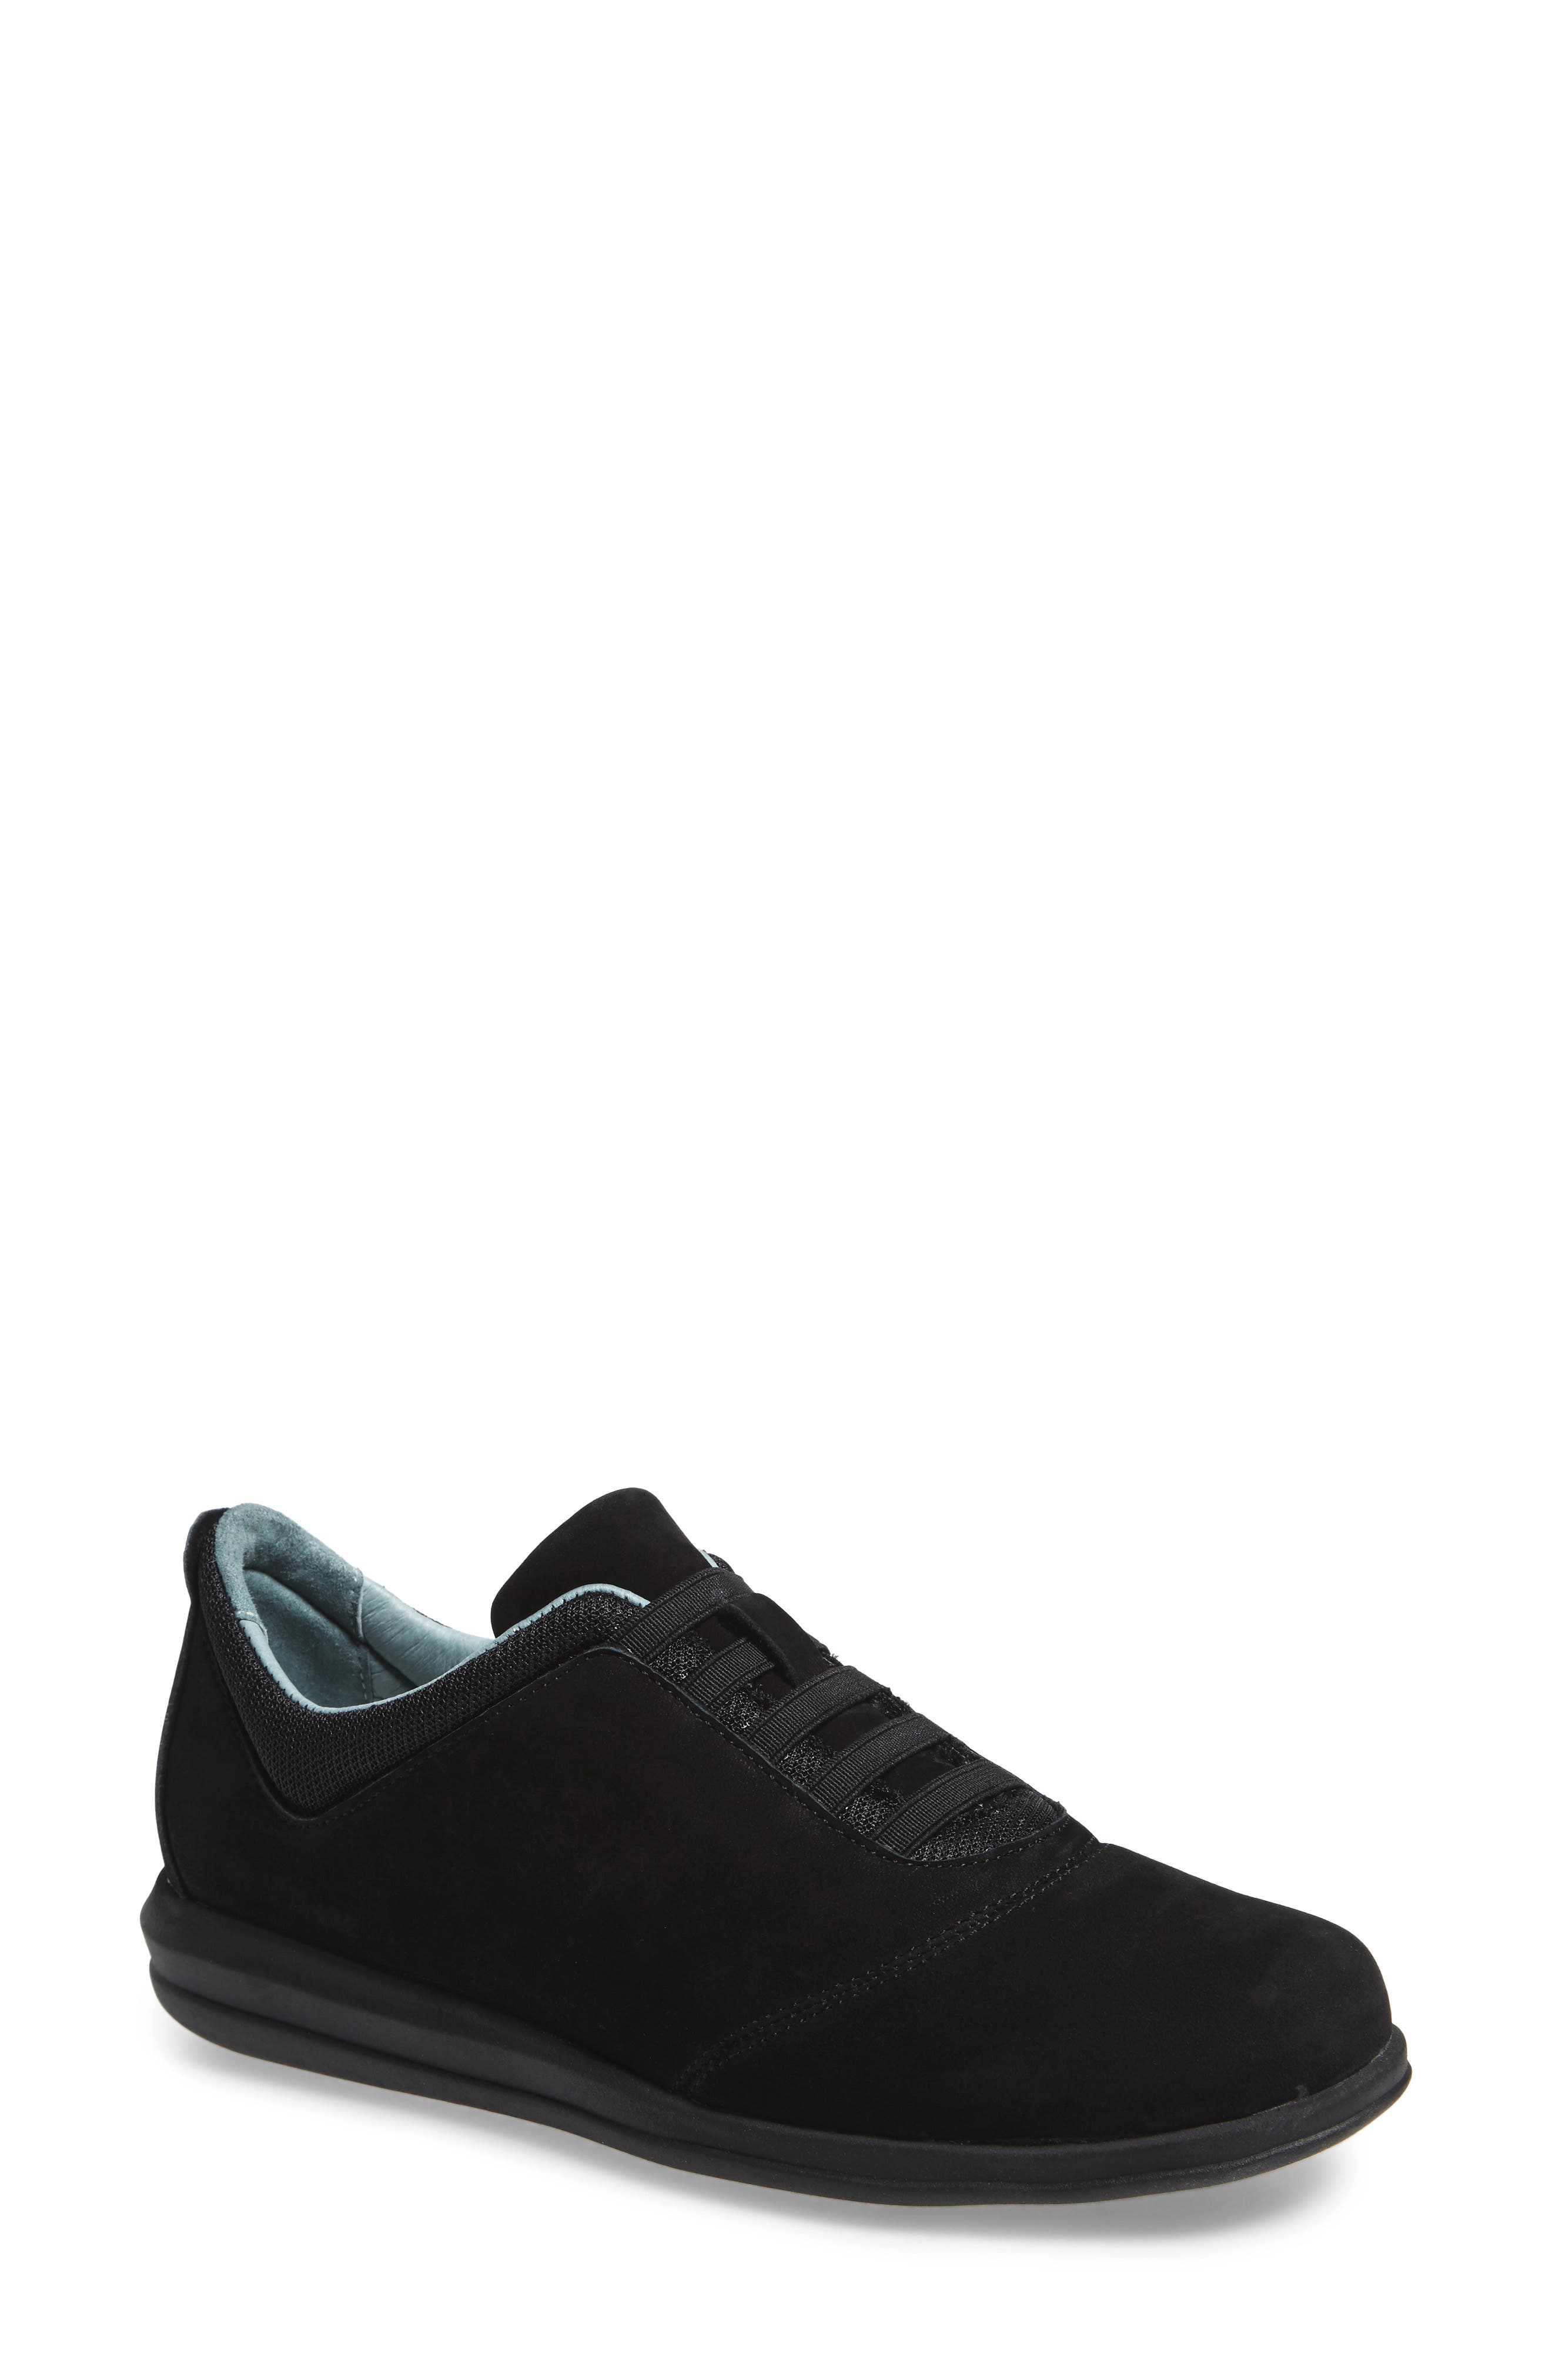 Dynamic Slip-On Sneaker,                             Main thumbnail 1, color,                             Black Nubuck